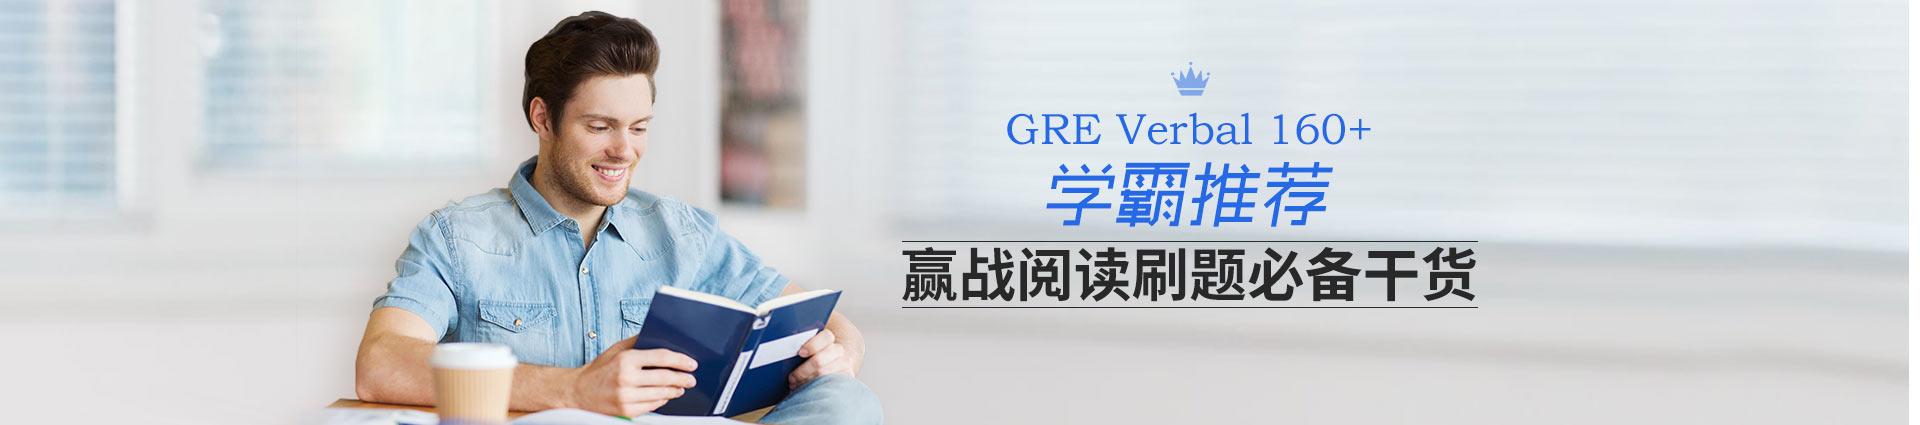 GRE V160+学霸推荐 赢战阅读